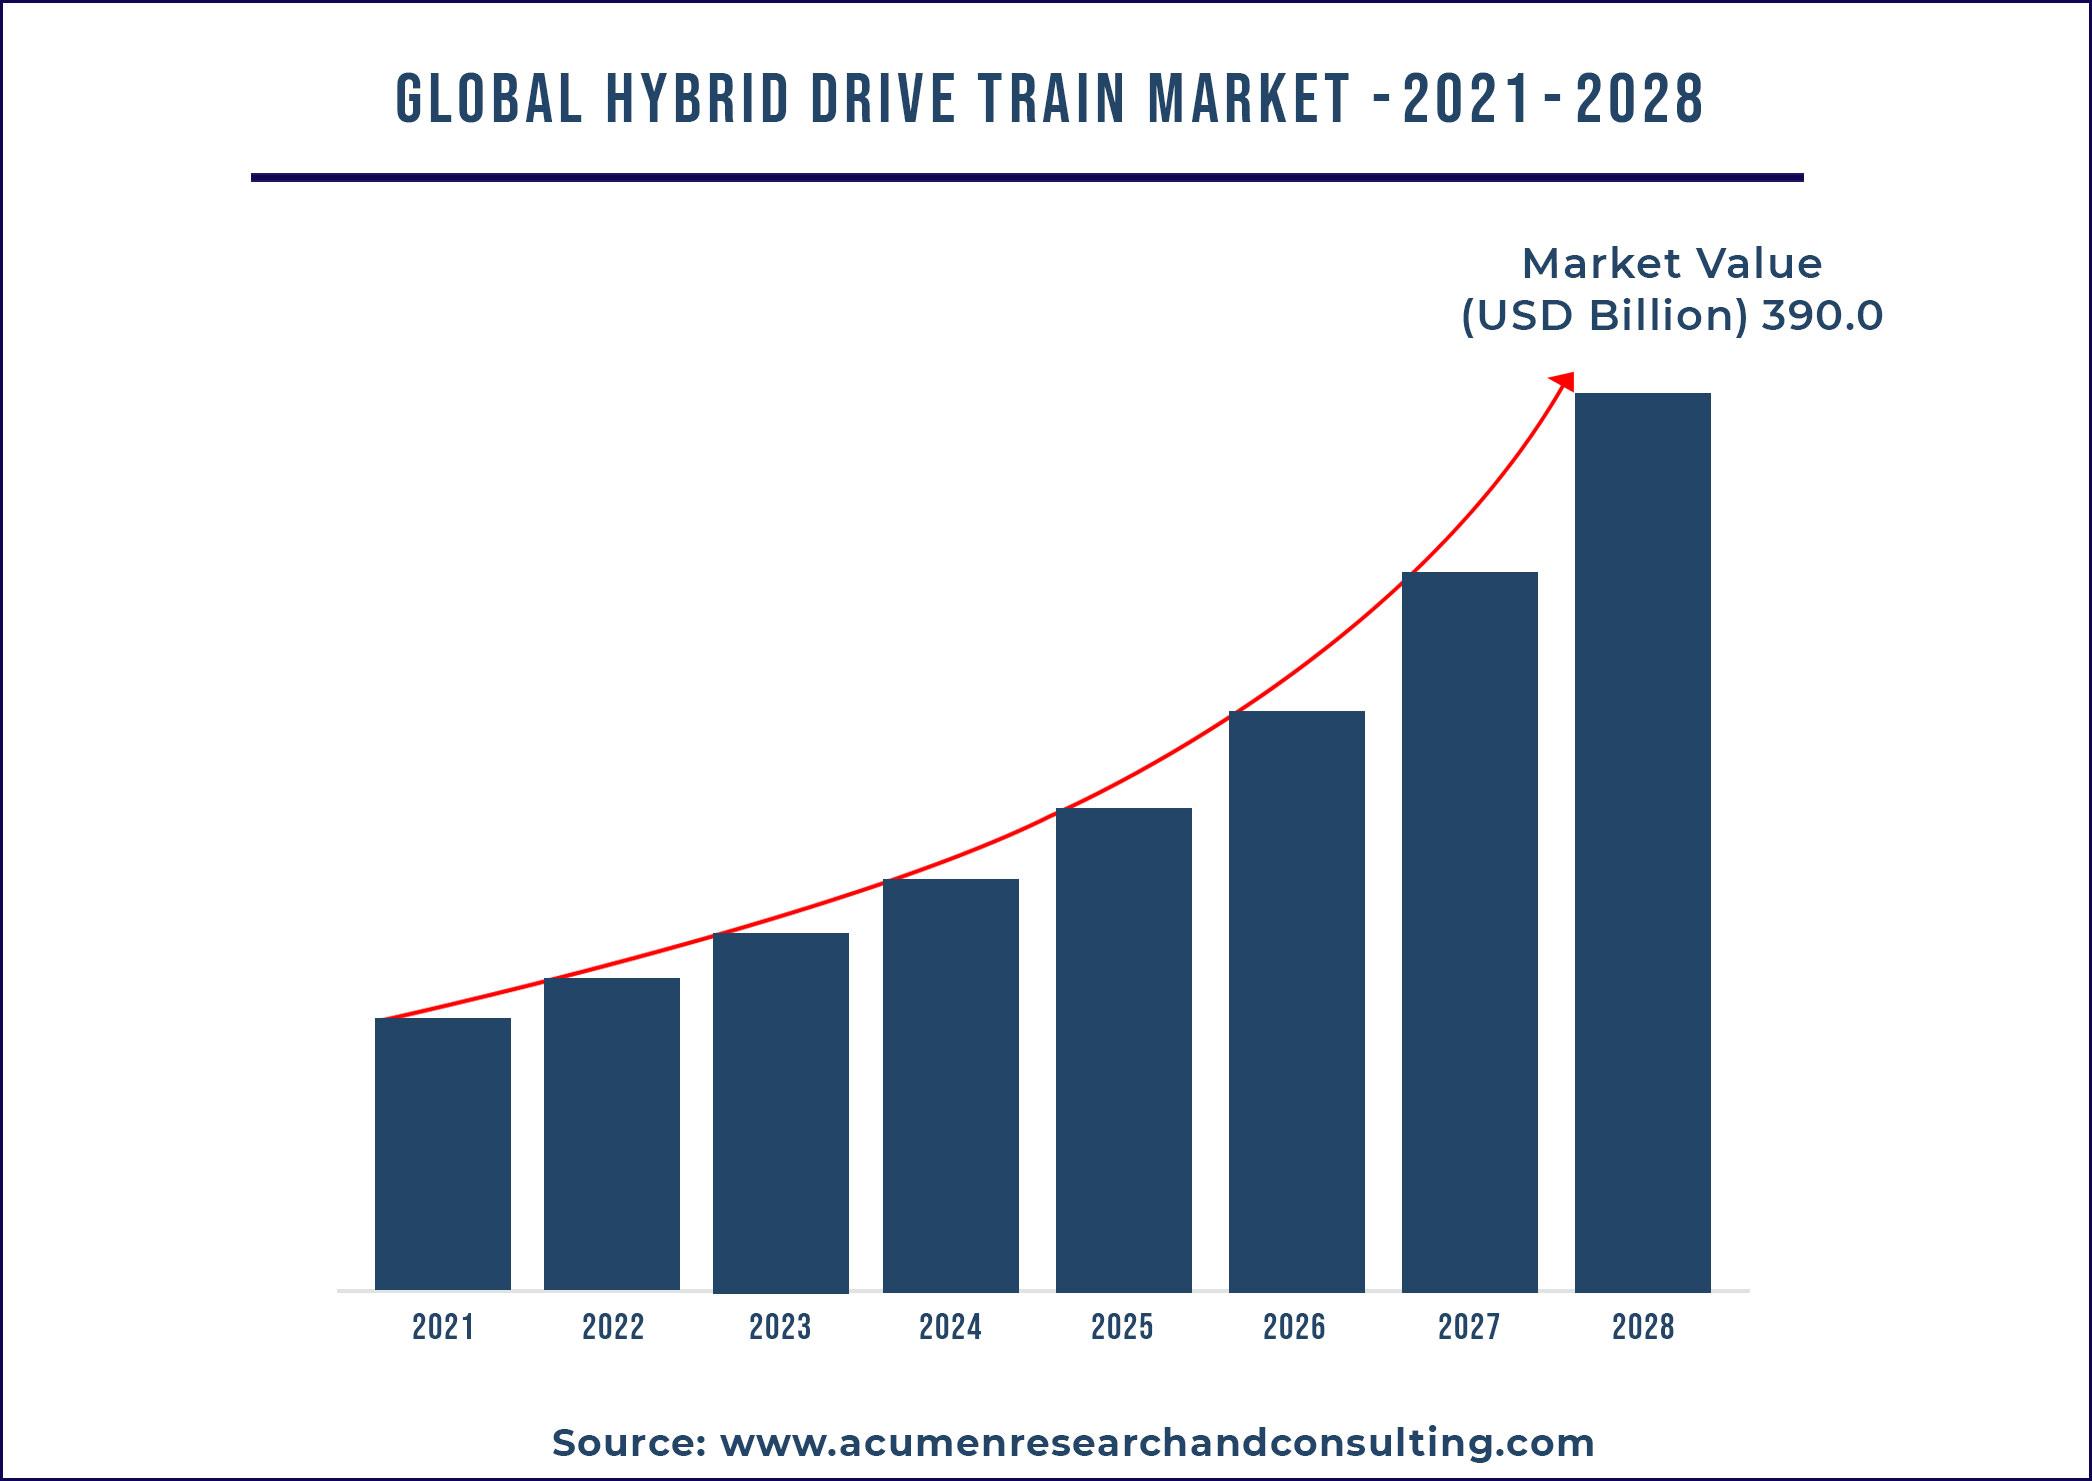 Hybrid Drive Train Market Size 2021 - 2028